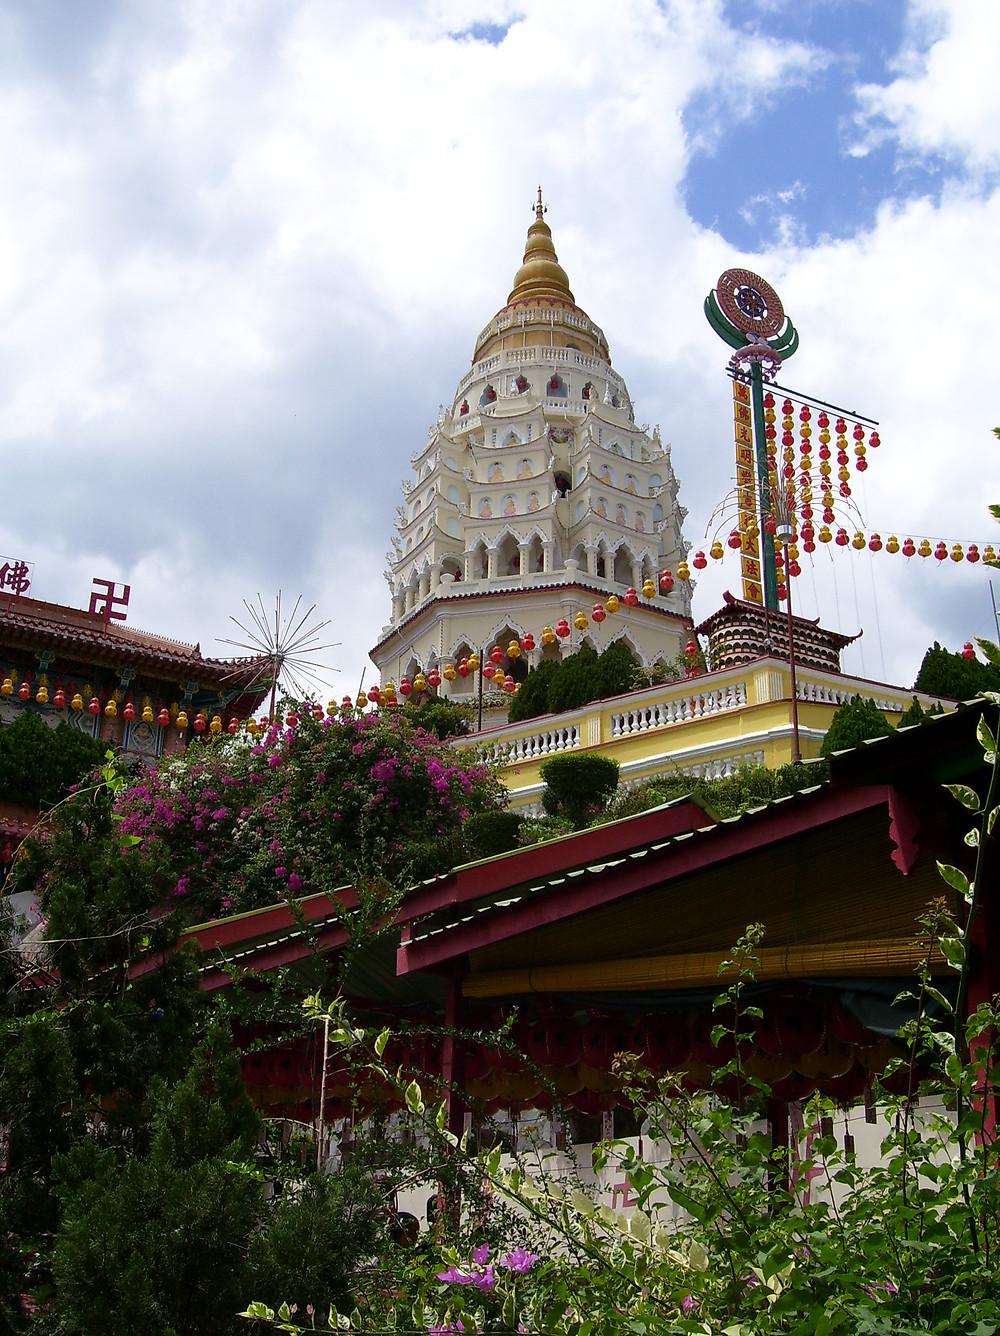 White pagoda blue sky clouds